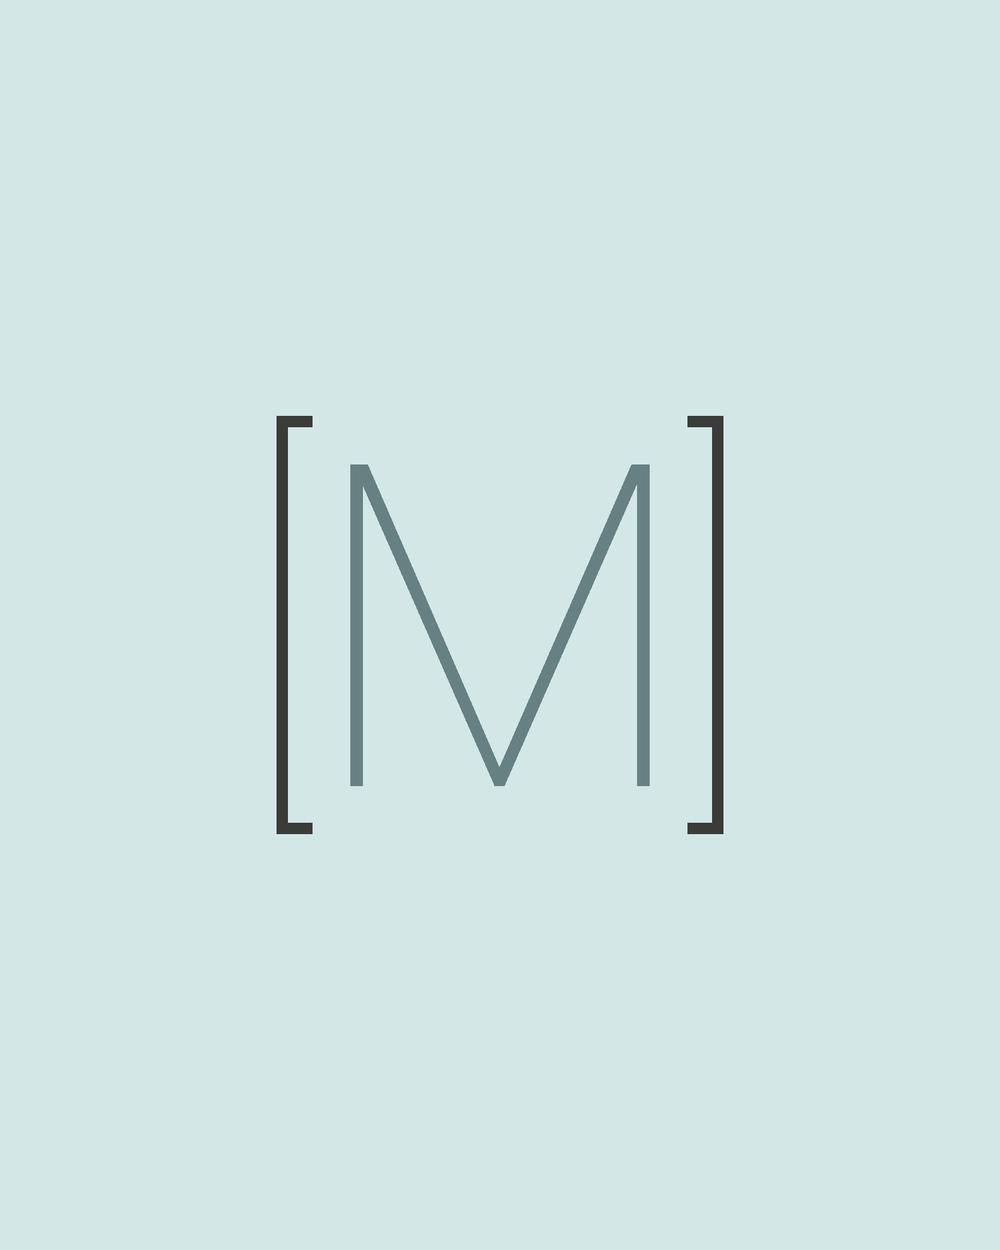 mintcollection-travel-branding-graphicdesign-iowa-worldwide-hospitatlity5.png